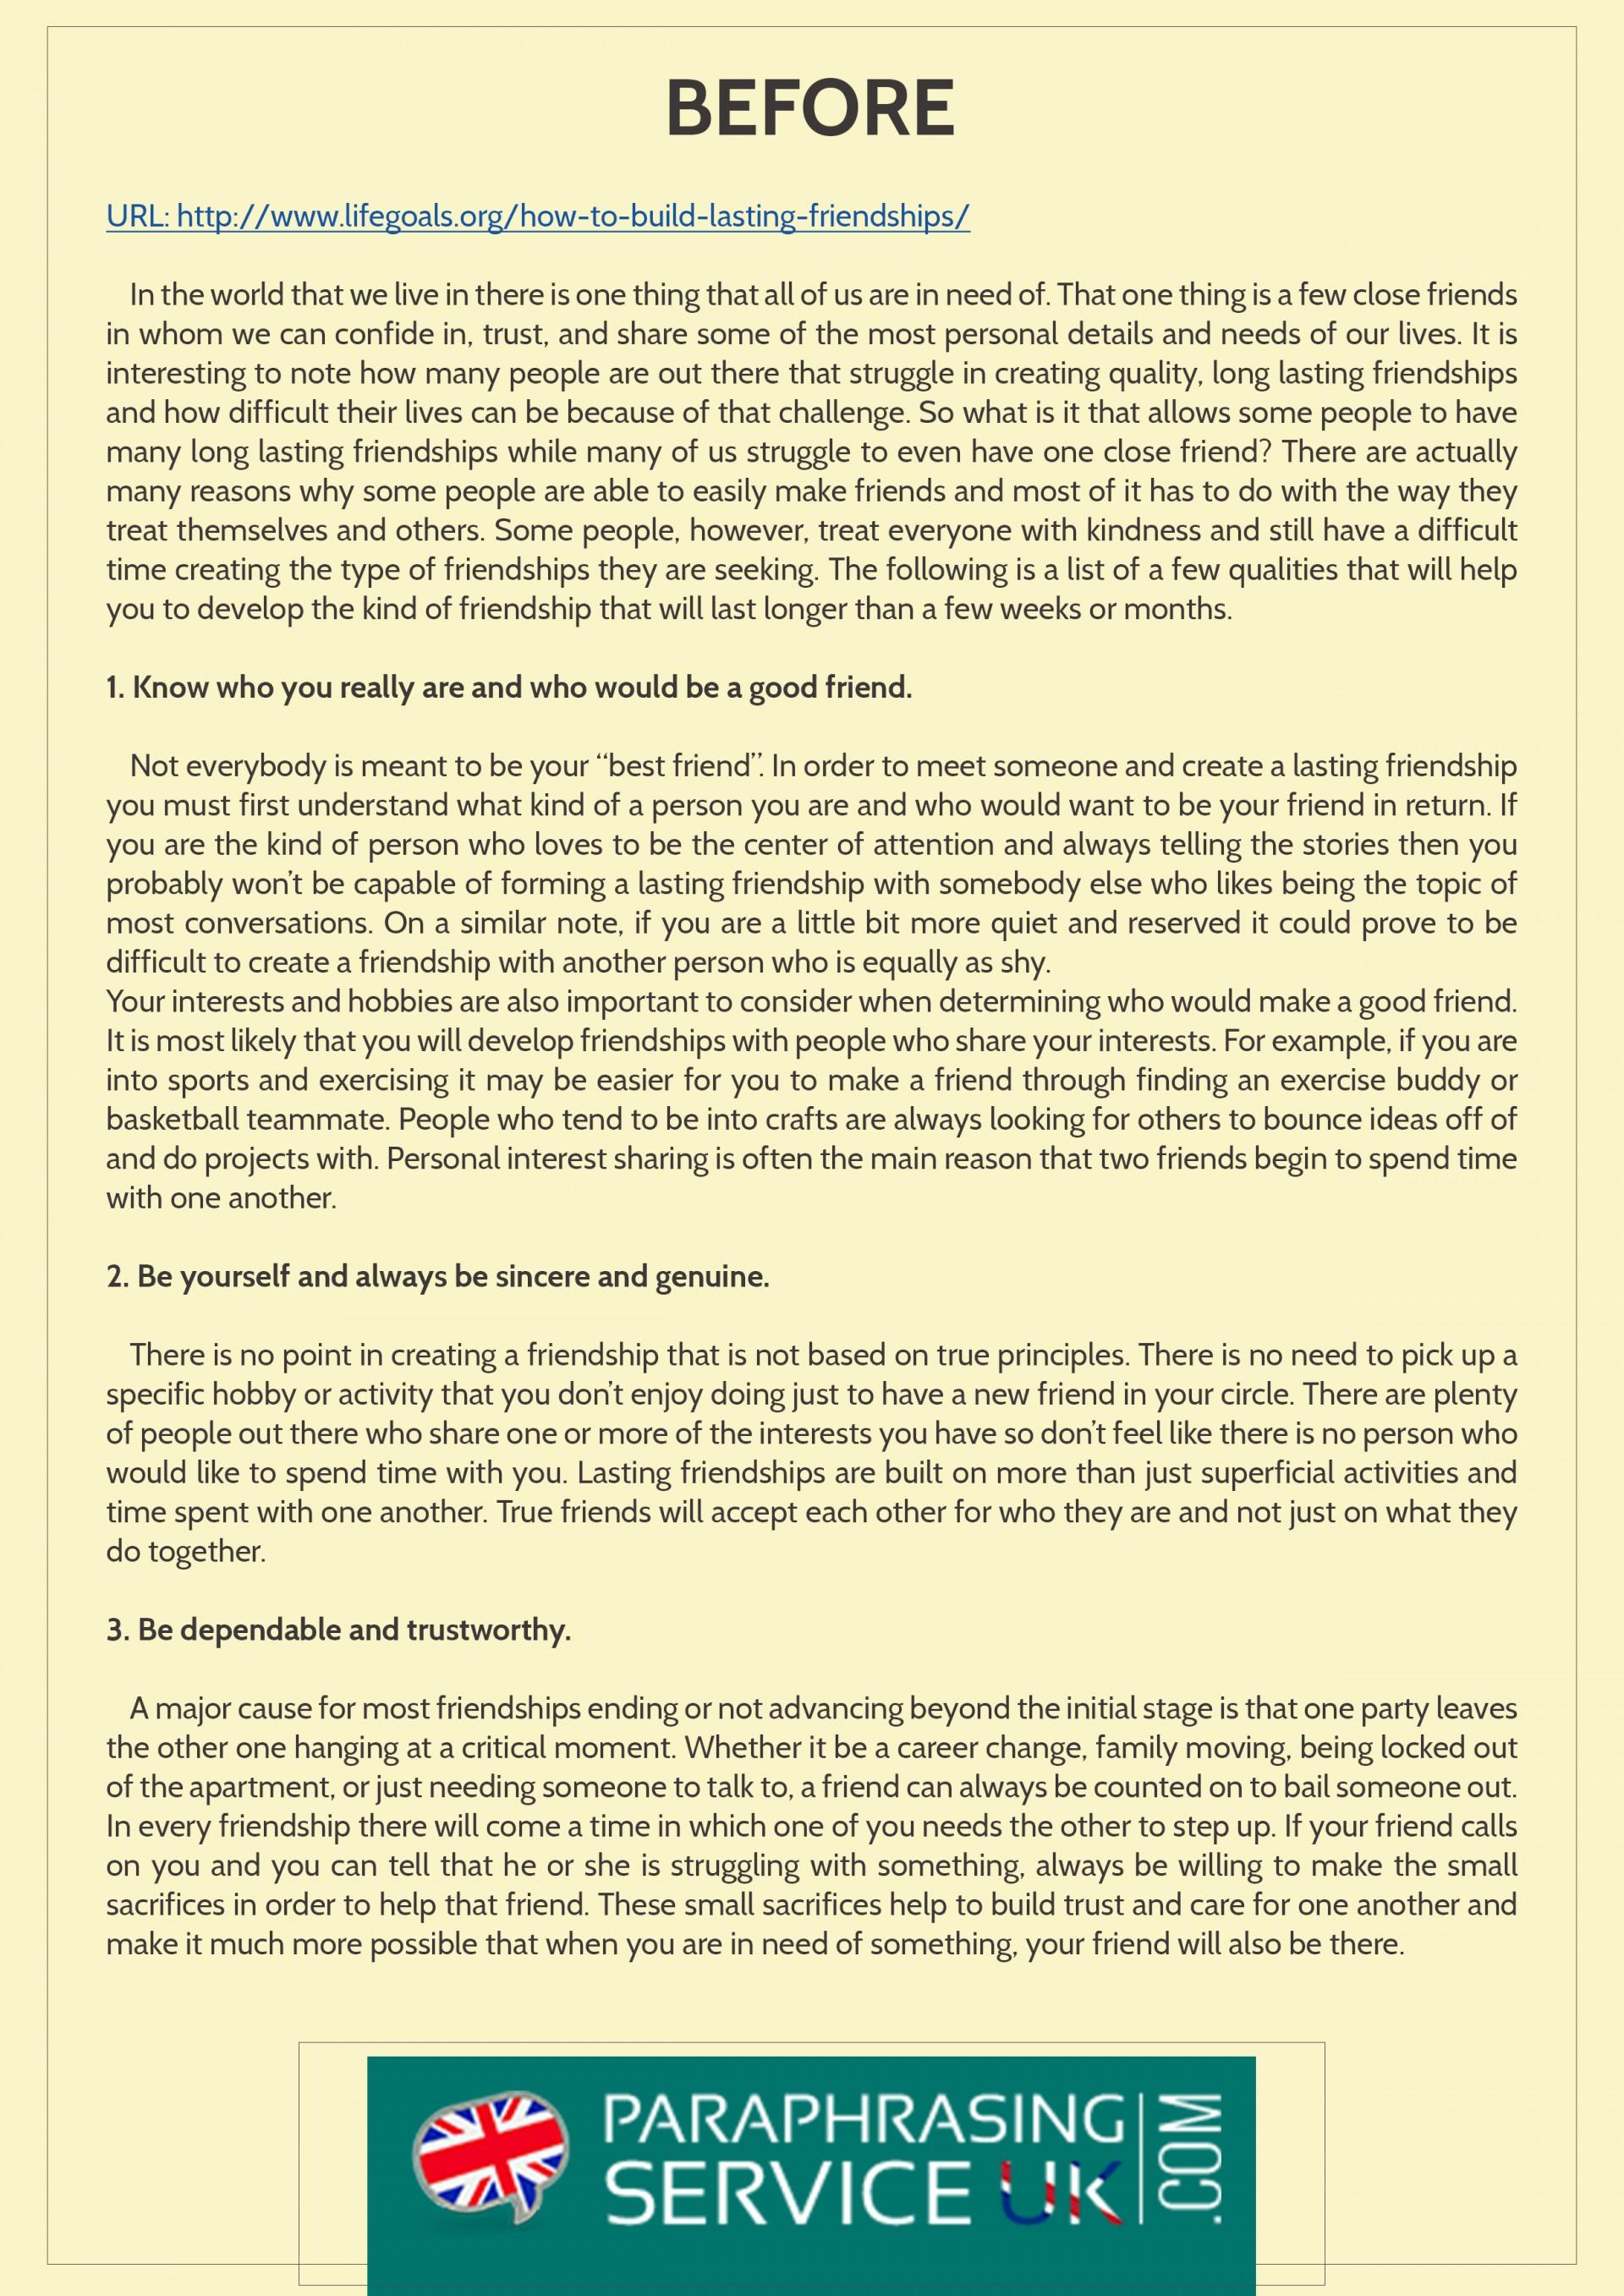 002 Original Essay Sample Example Magnificent Reworder Best Rewriter Software Free Download App 1920